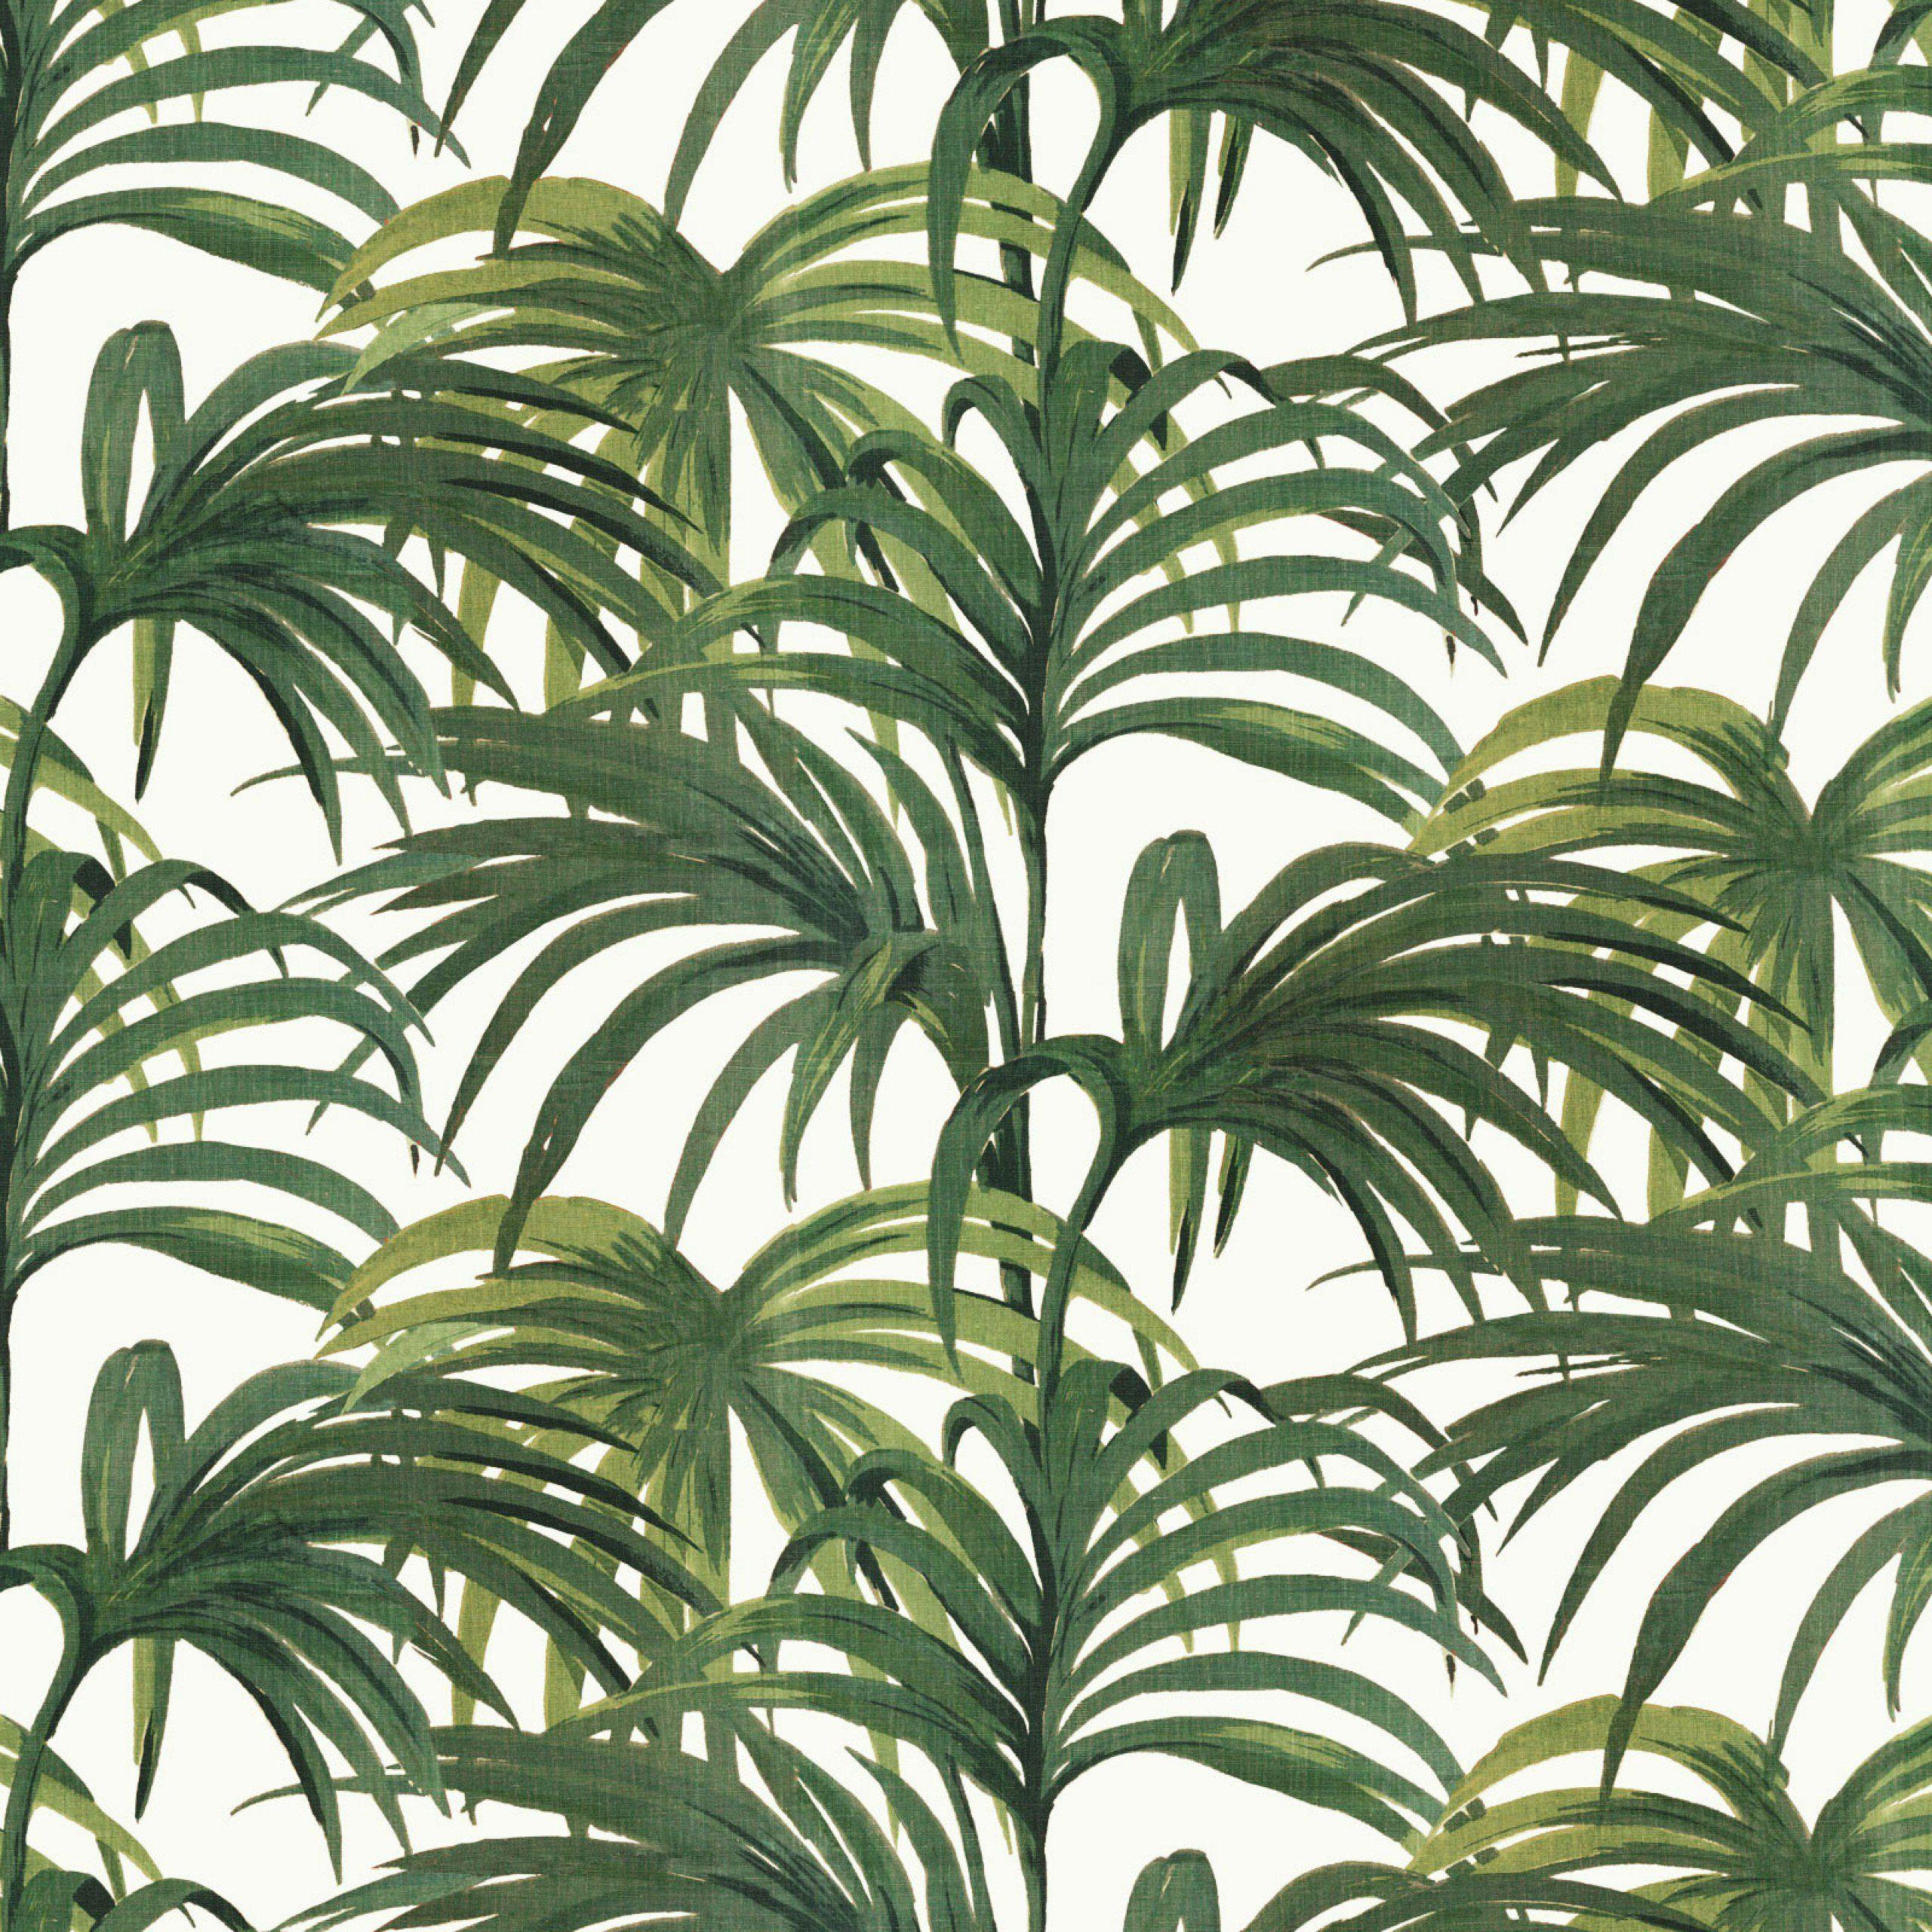 palmeral is an art deco inspired patio print featuring an, Wohnzimmer dekoo